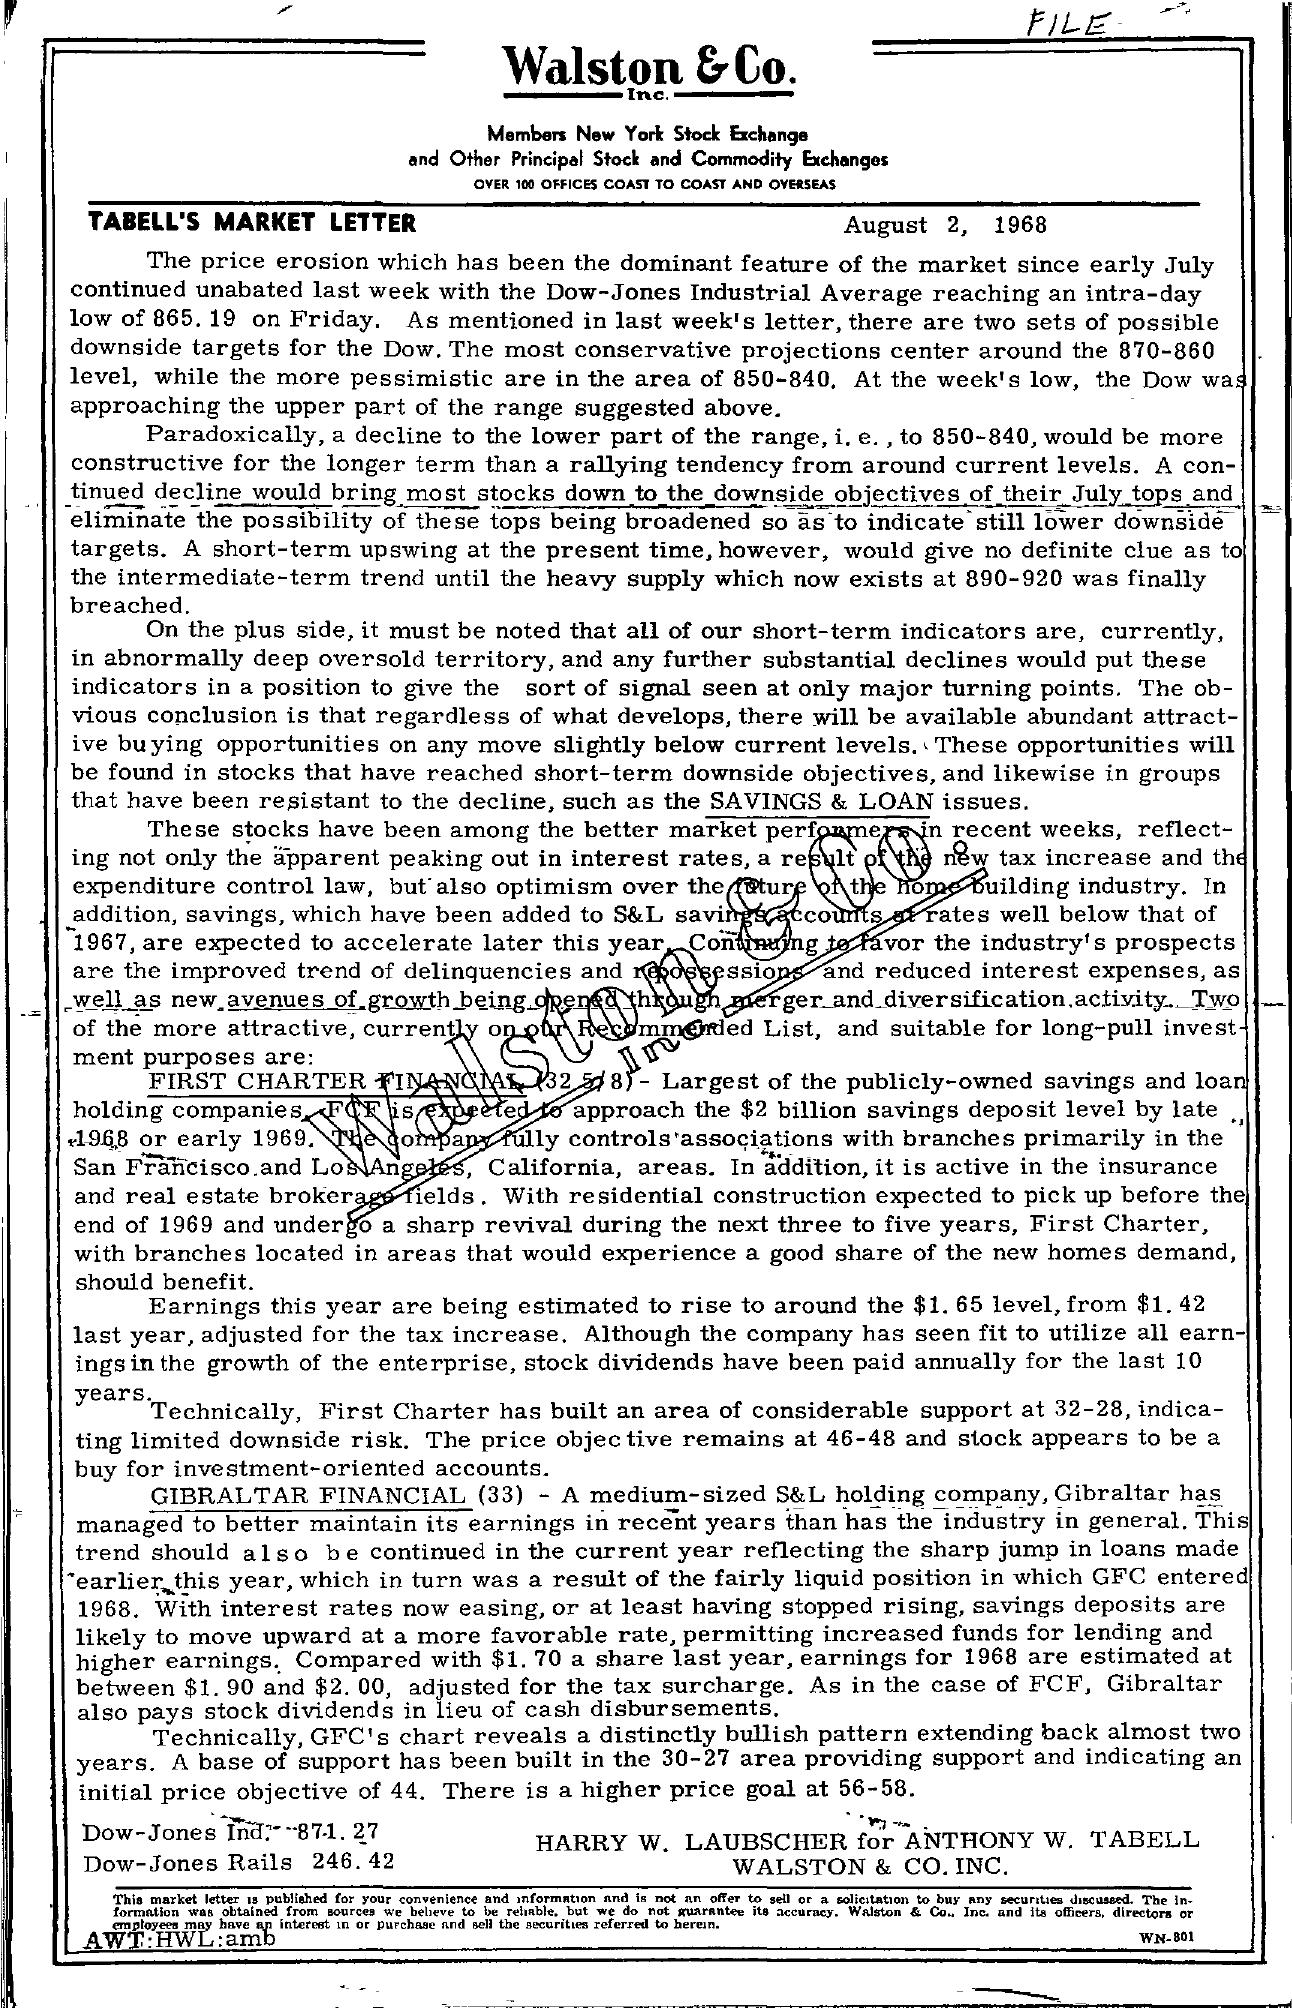 Tabell's Market Letter - August 02, 1968